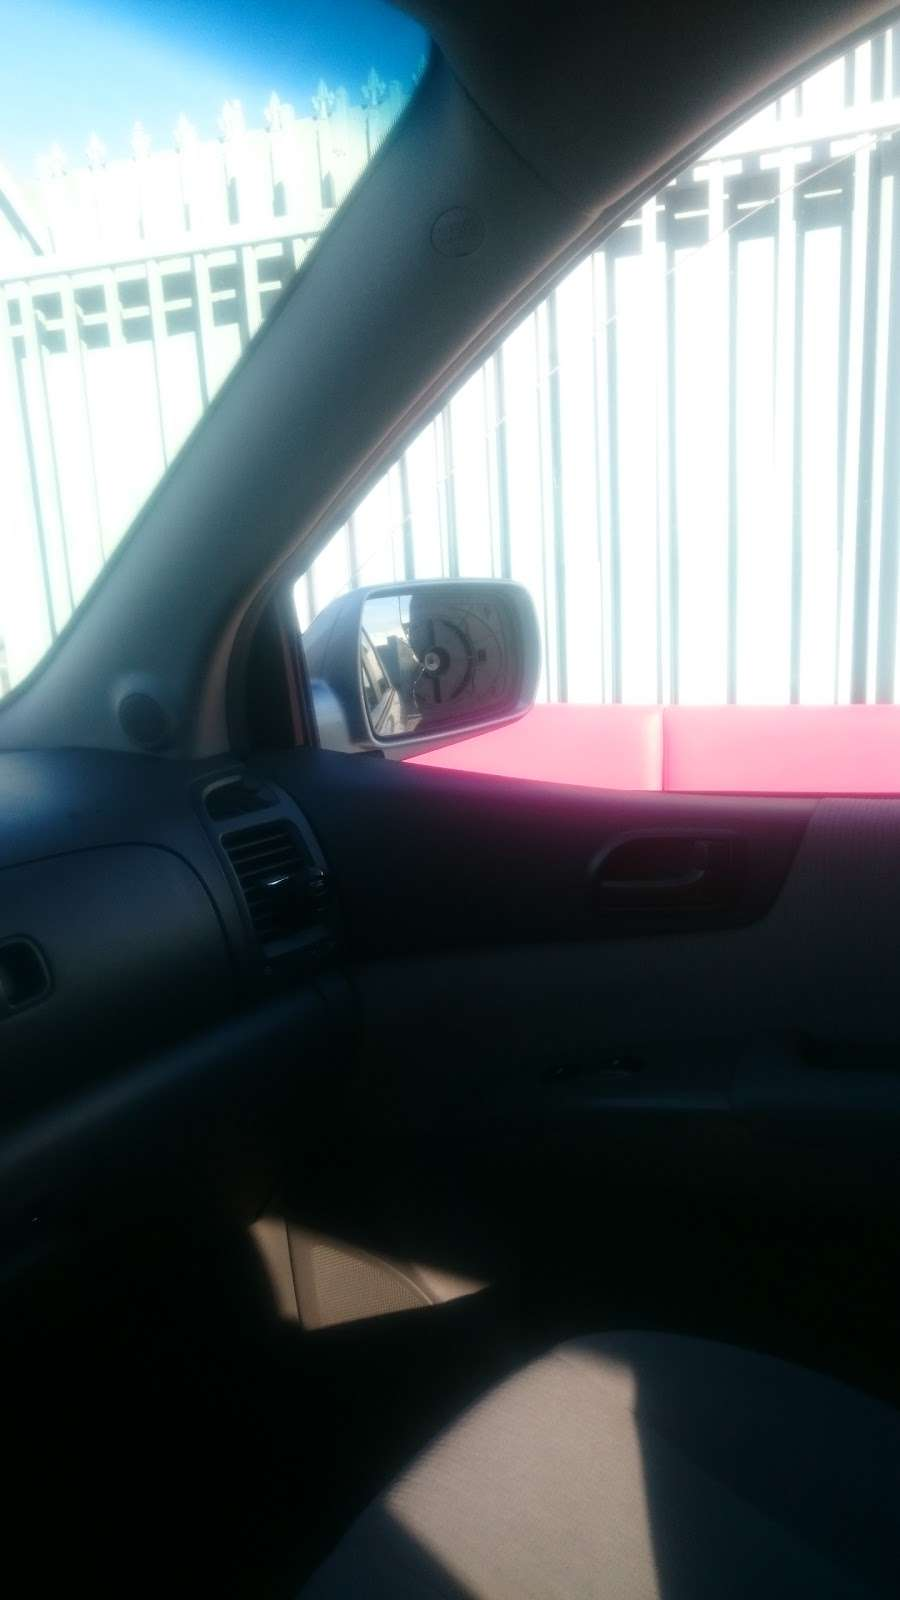 Michoacan Auto Glass - car repair  | Photo 9 of 9 | Address: 9405 Alameda St, Los Angeles, CA 90002, USA | Phone: (323) 567-1662